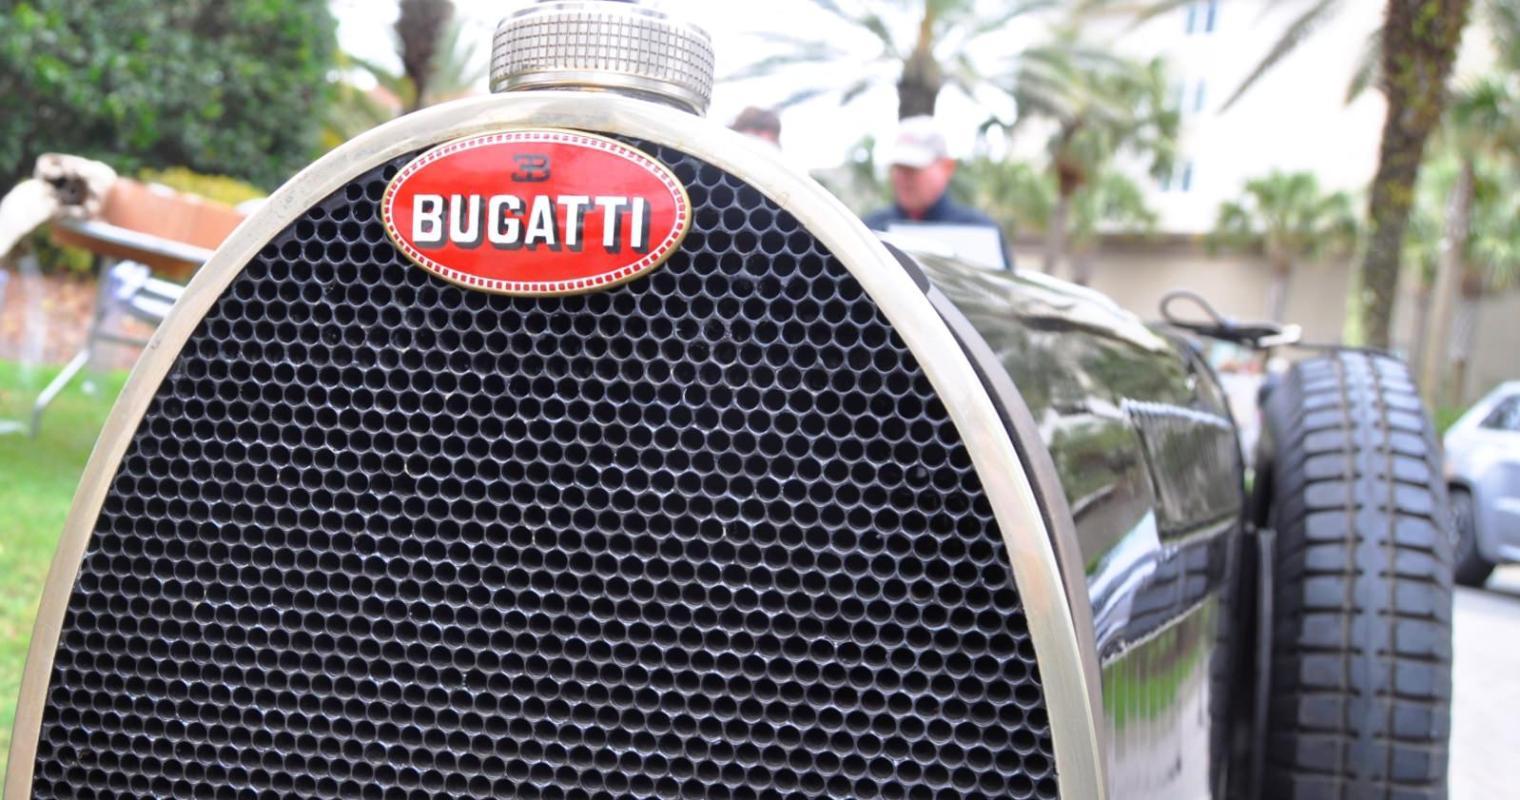 PurSang Argentina Shows Innovative Marketing with Street-Parked 1920s Bugatti GP Car25